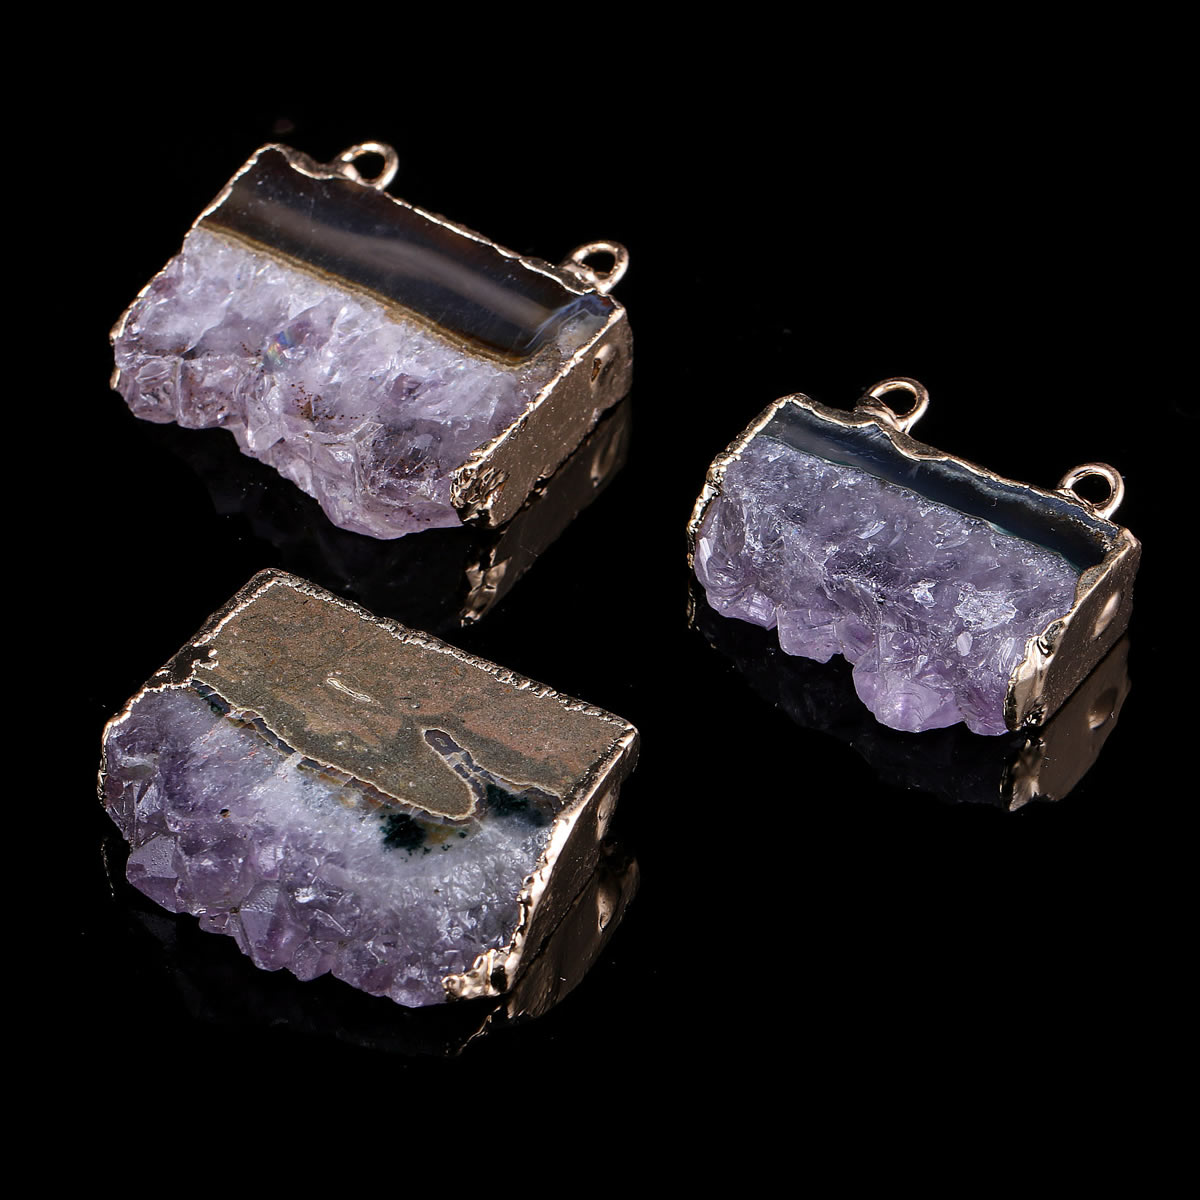 Irregular Shape Purple Quartzs Pendant Necklace Reiki Healing Natural Stone Amulet DIY Jewelry Personality Gift Size 35x30mm